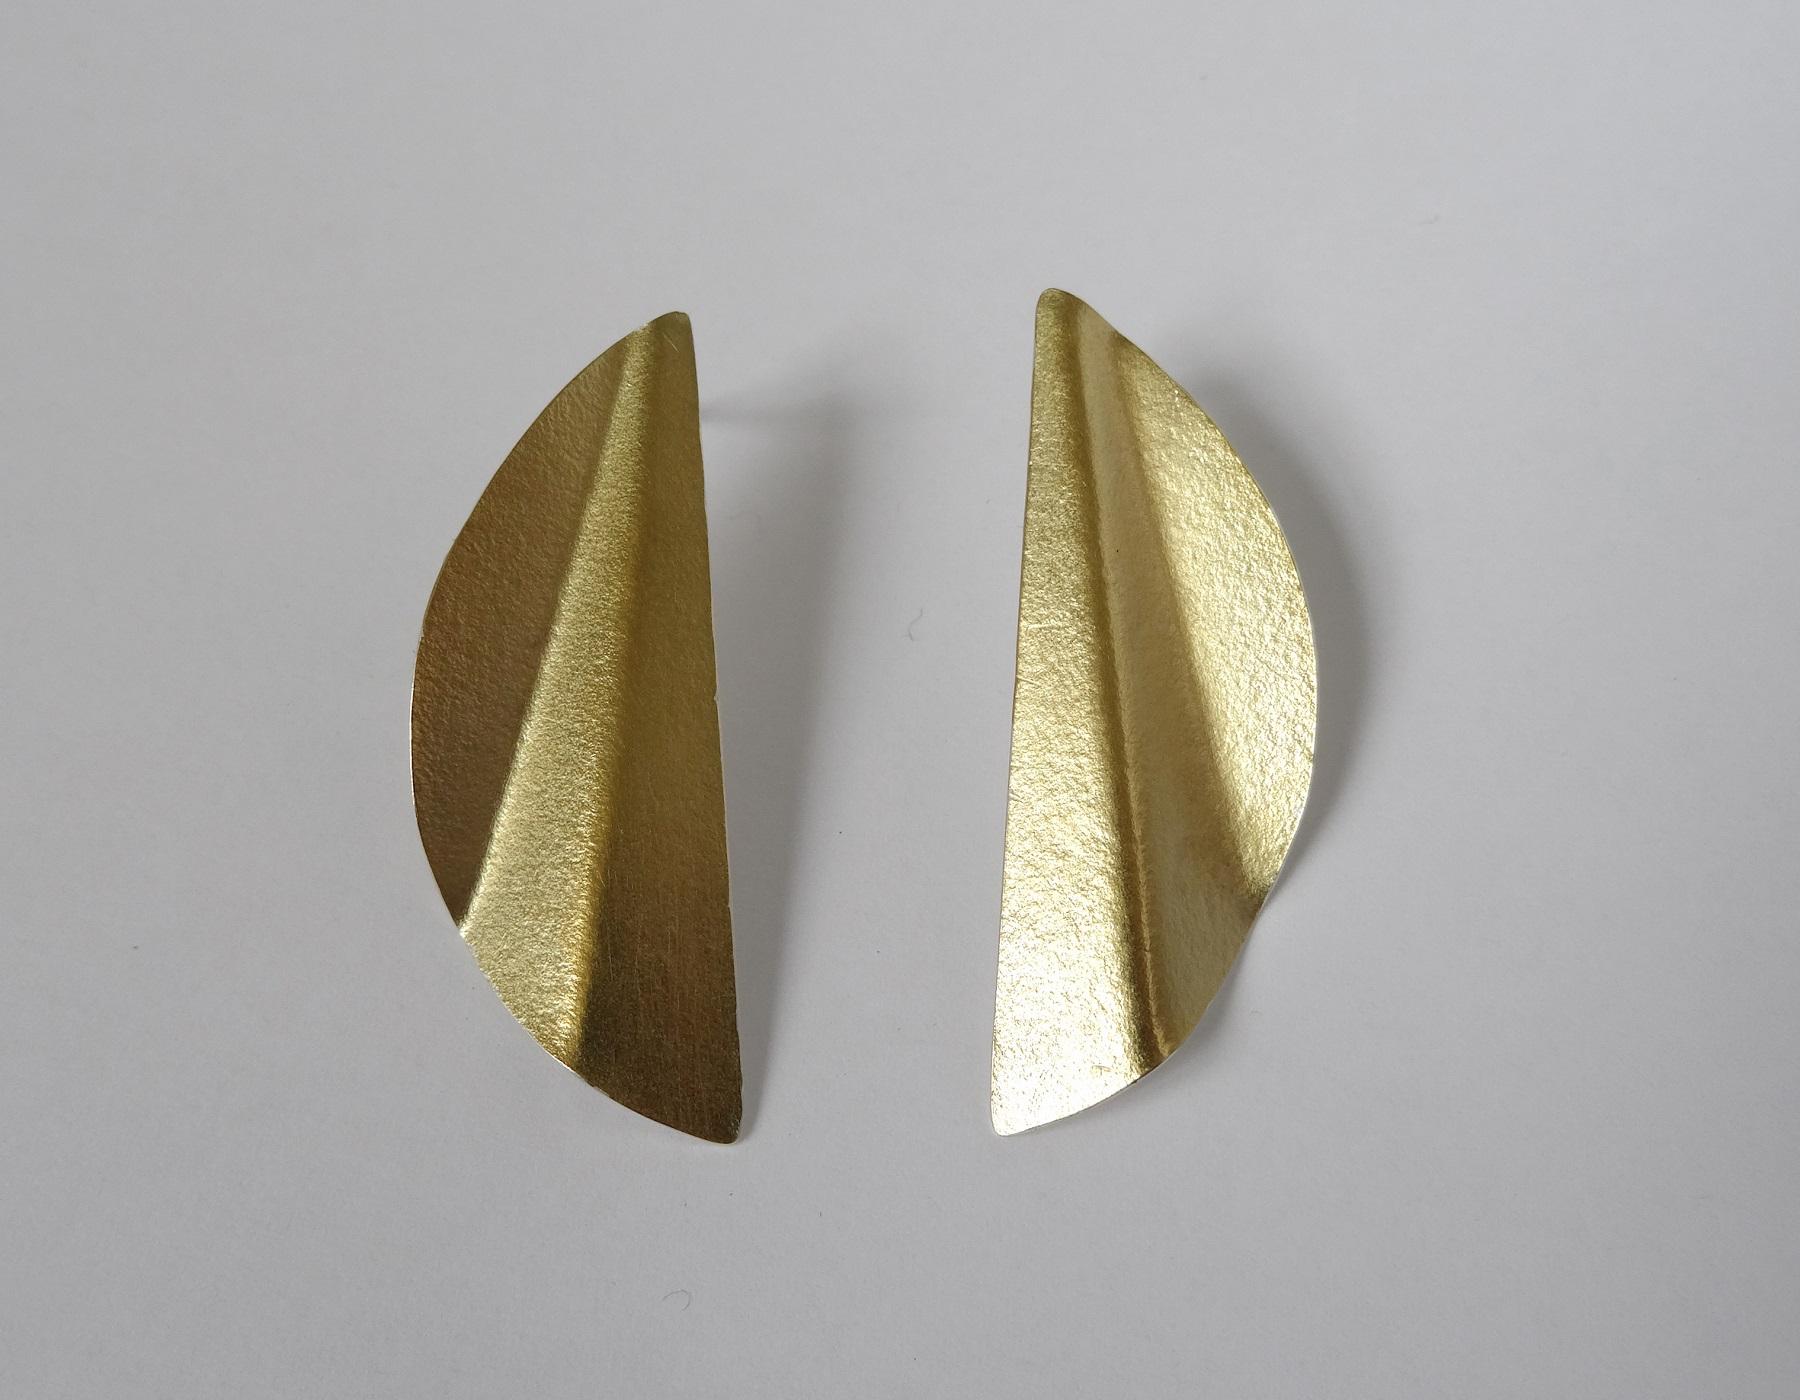 Viki Pearce Jewellery (2) RS.jpg